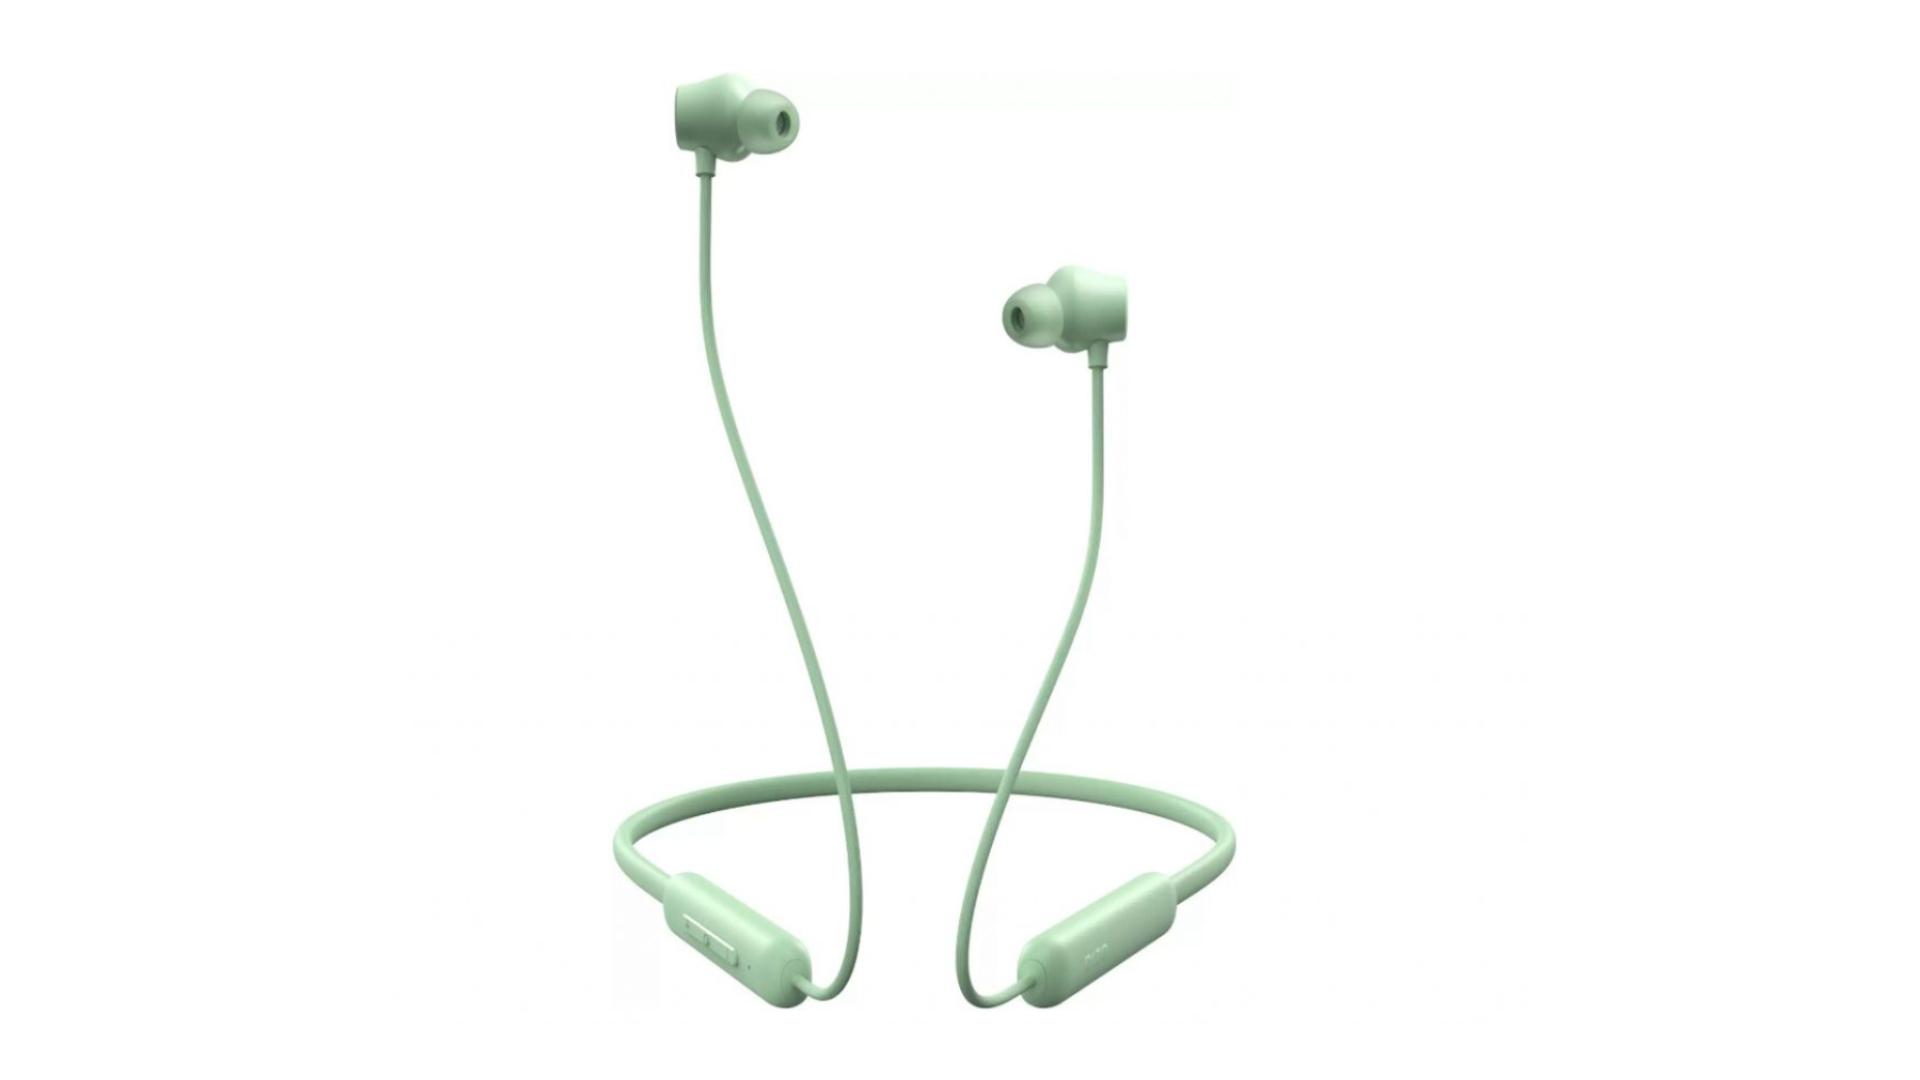 DIZO Wireless Neckband Earphones